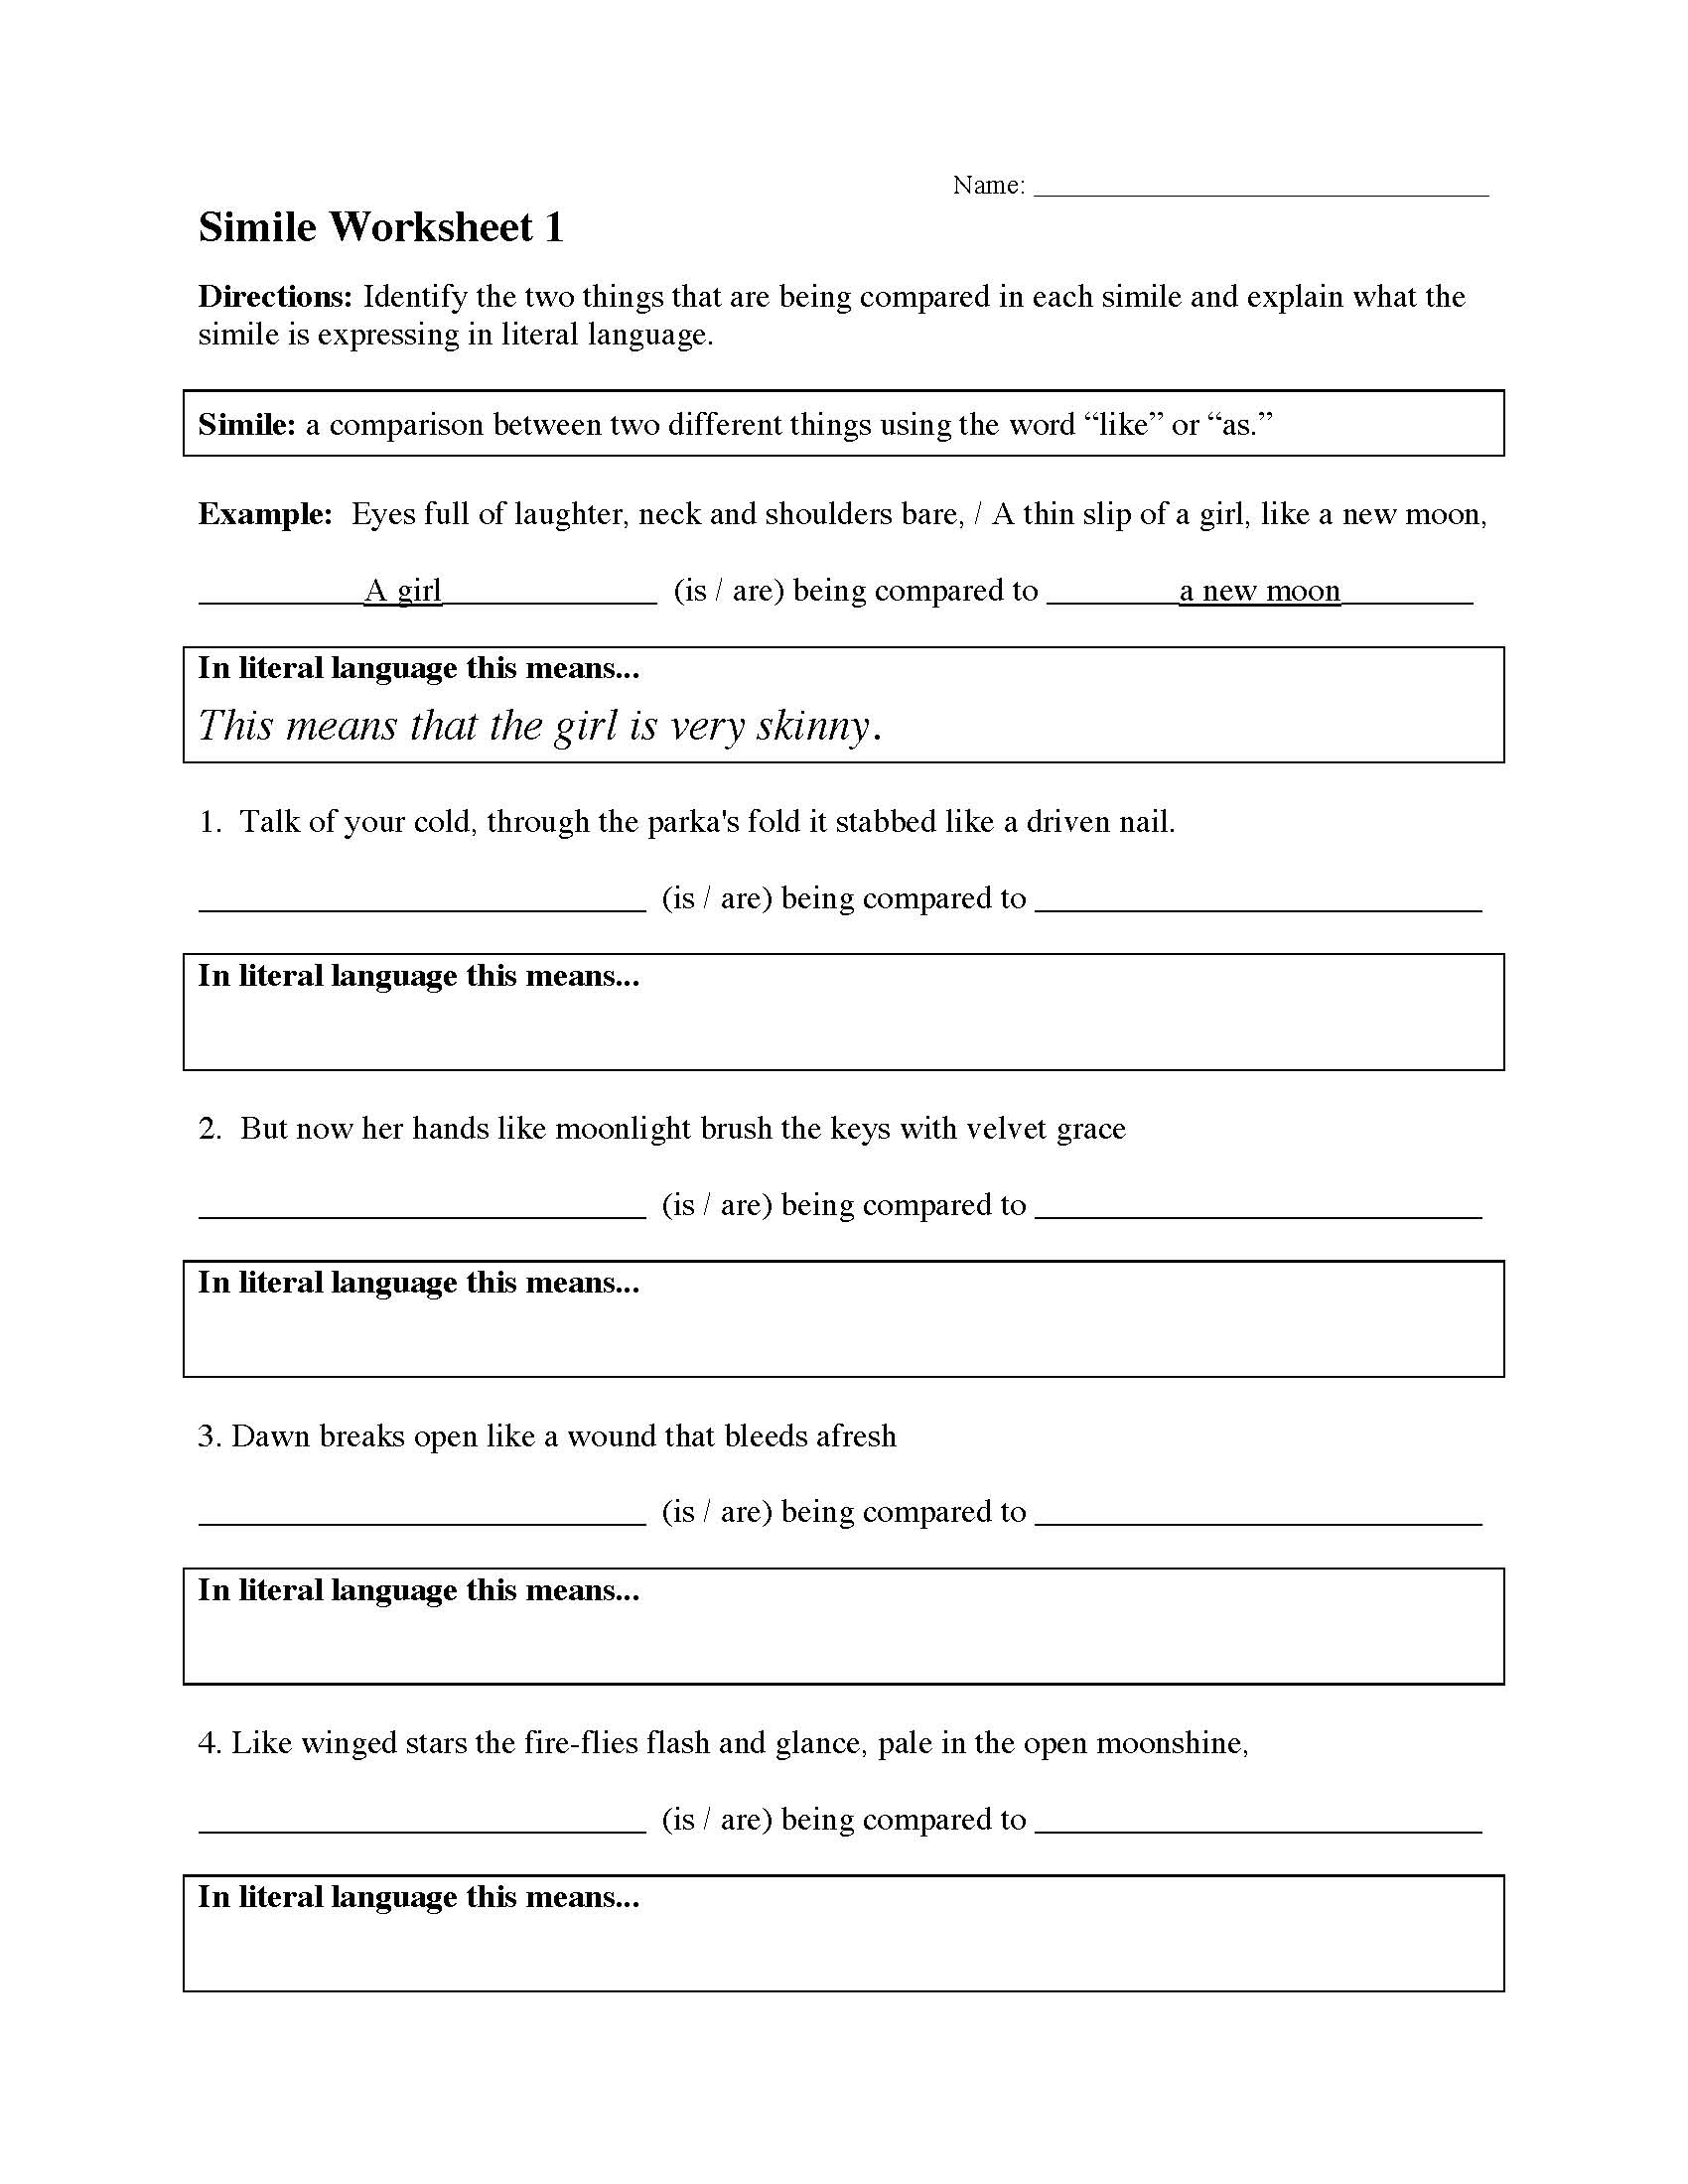 Simile Worksheet 1